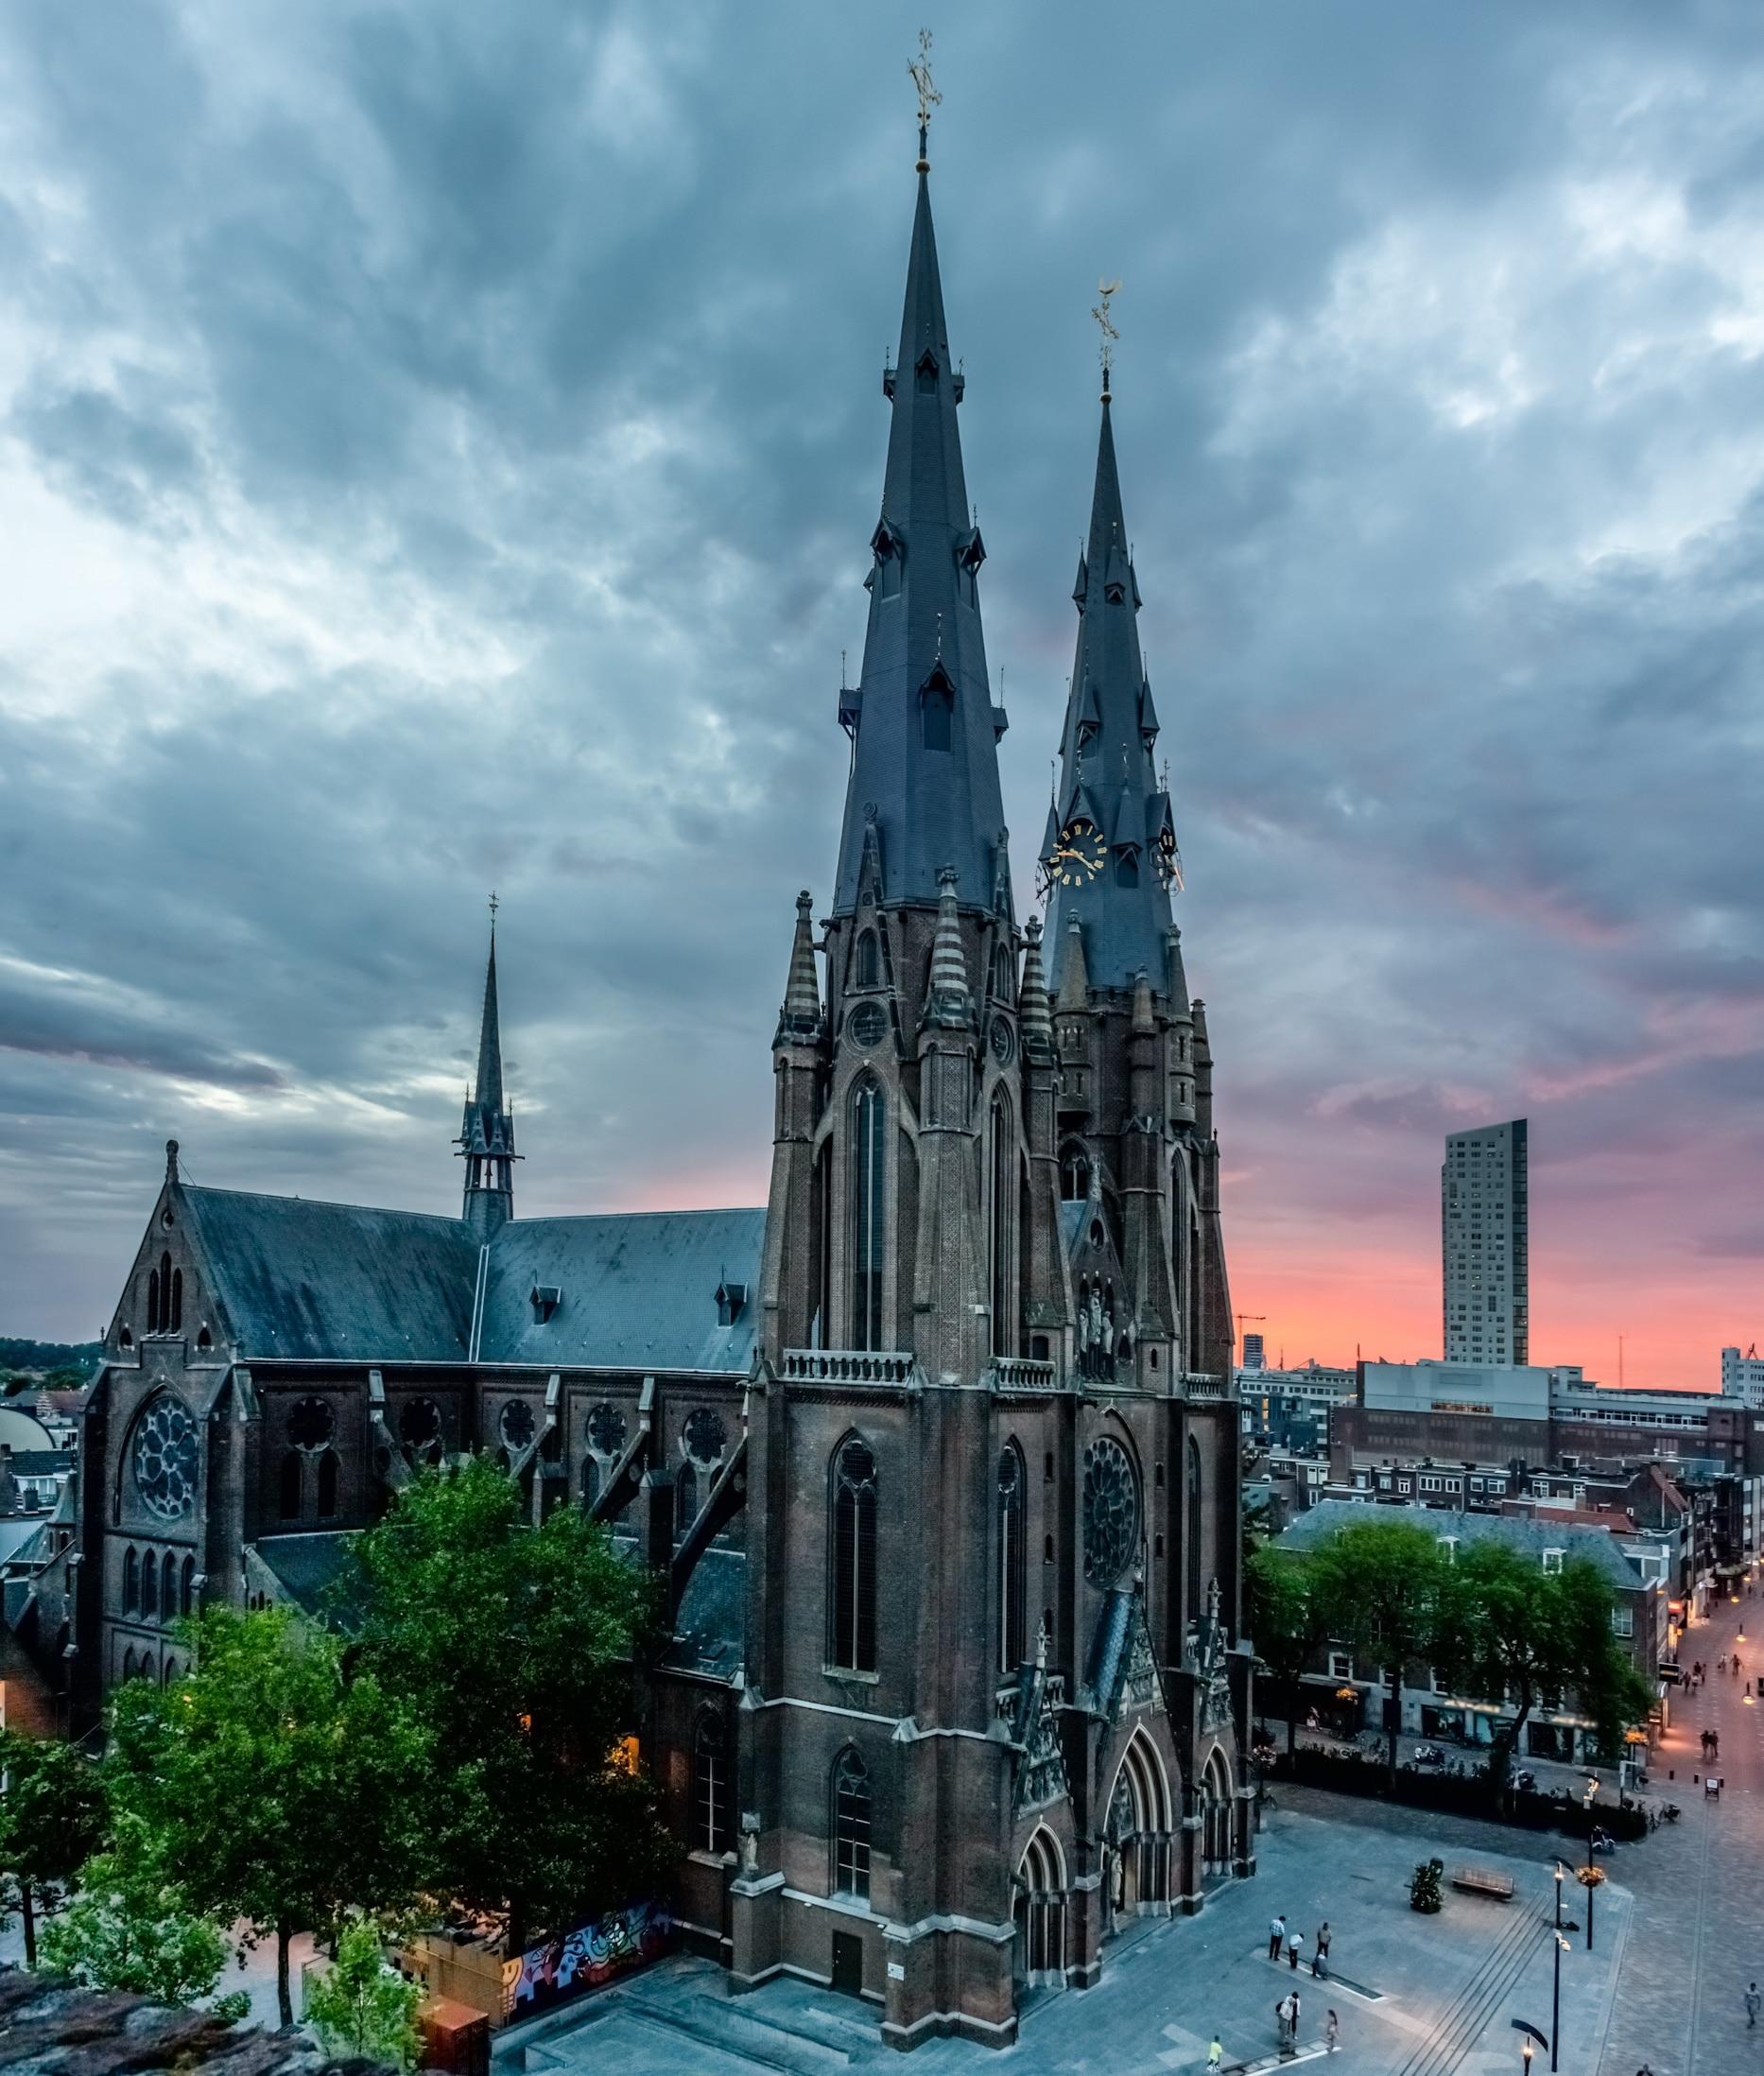 St. Catherine Church, Krakow, Lesser Poland Voivodeship, Poland